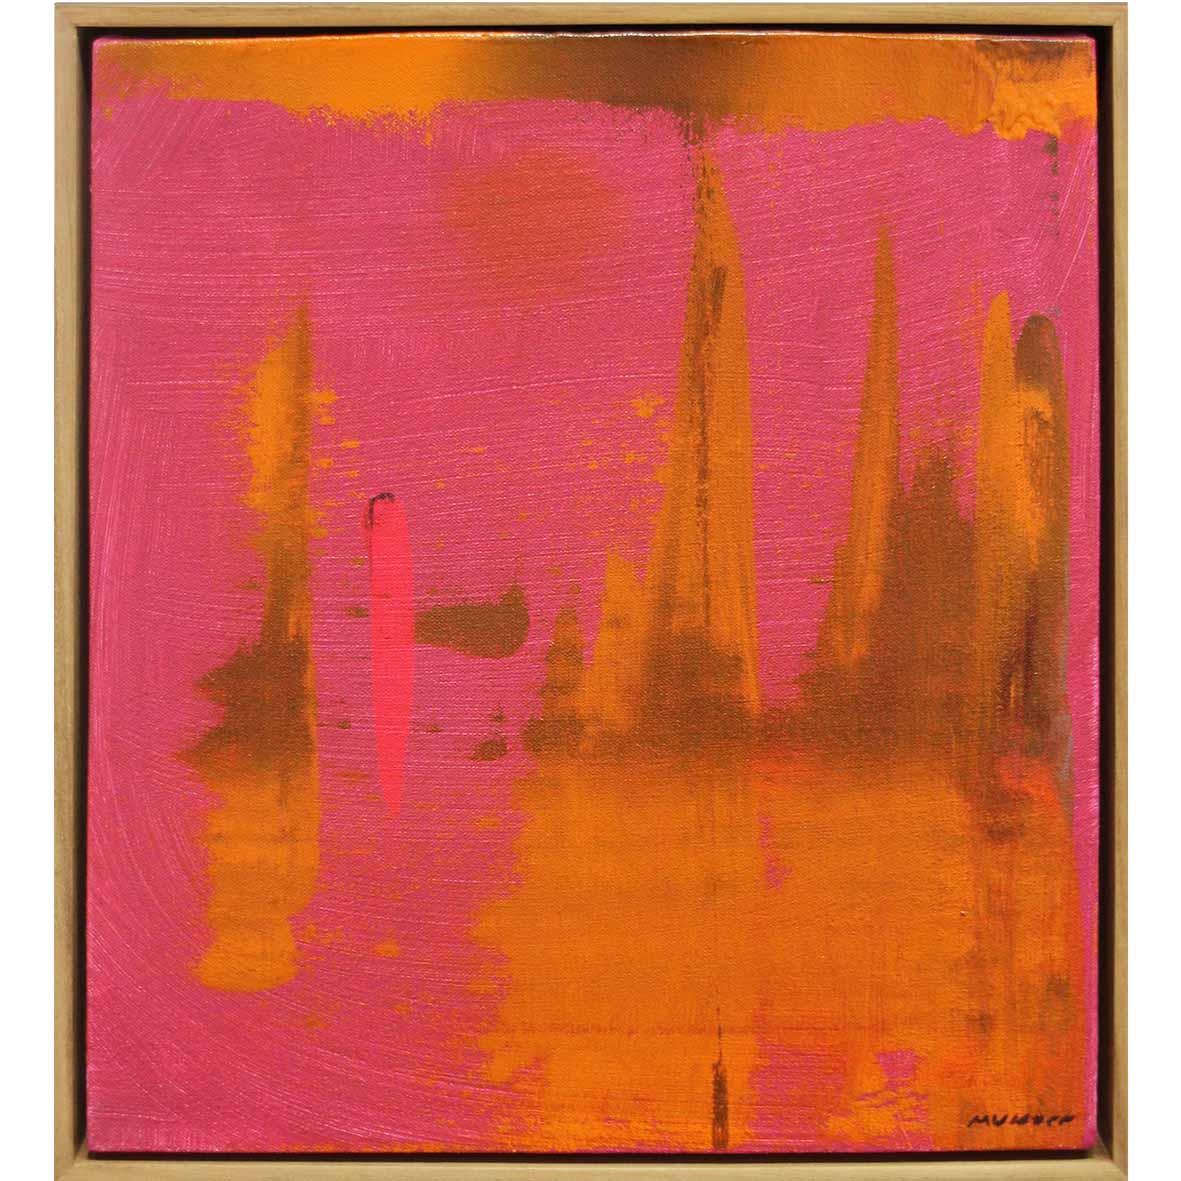 Mary Visser Kaleo 2018 acrylic on canvas 34 x 30 cm